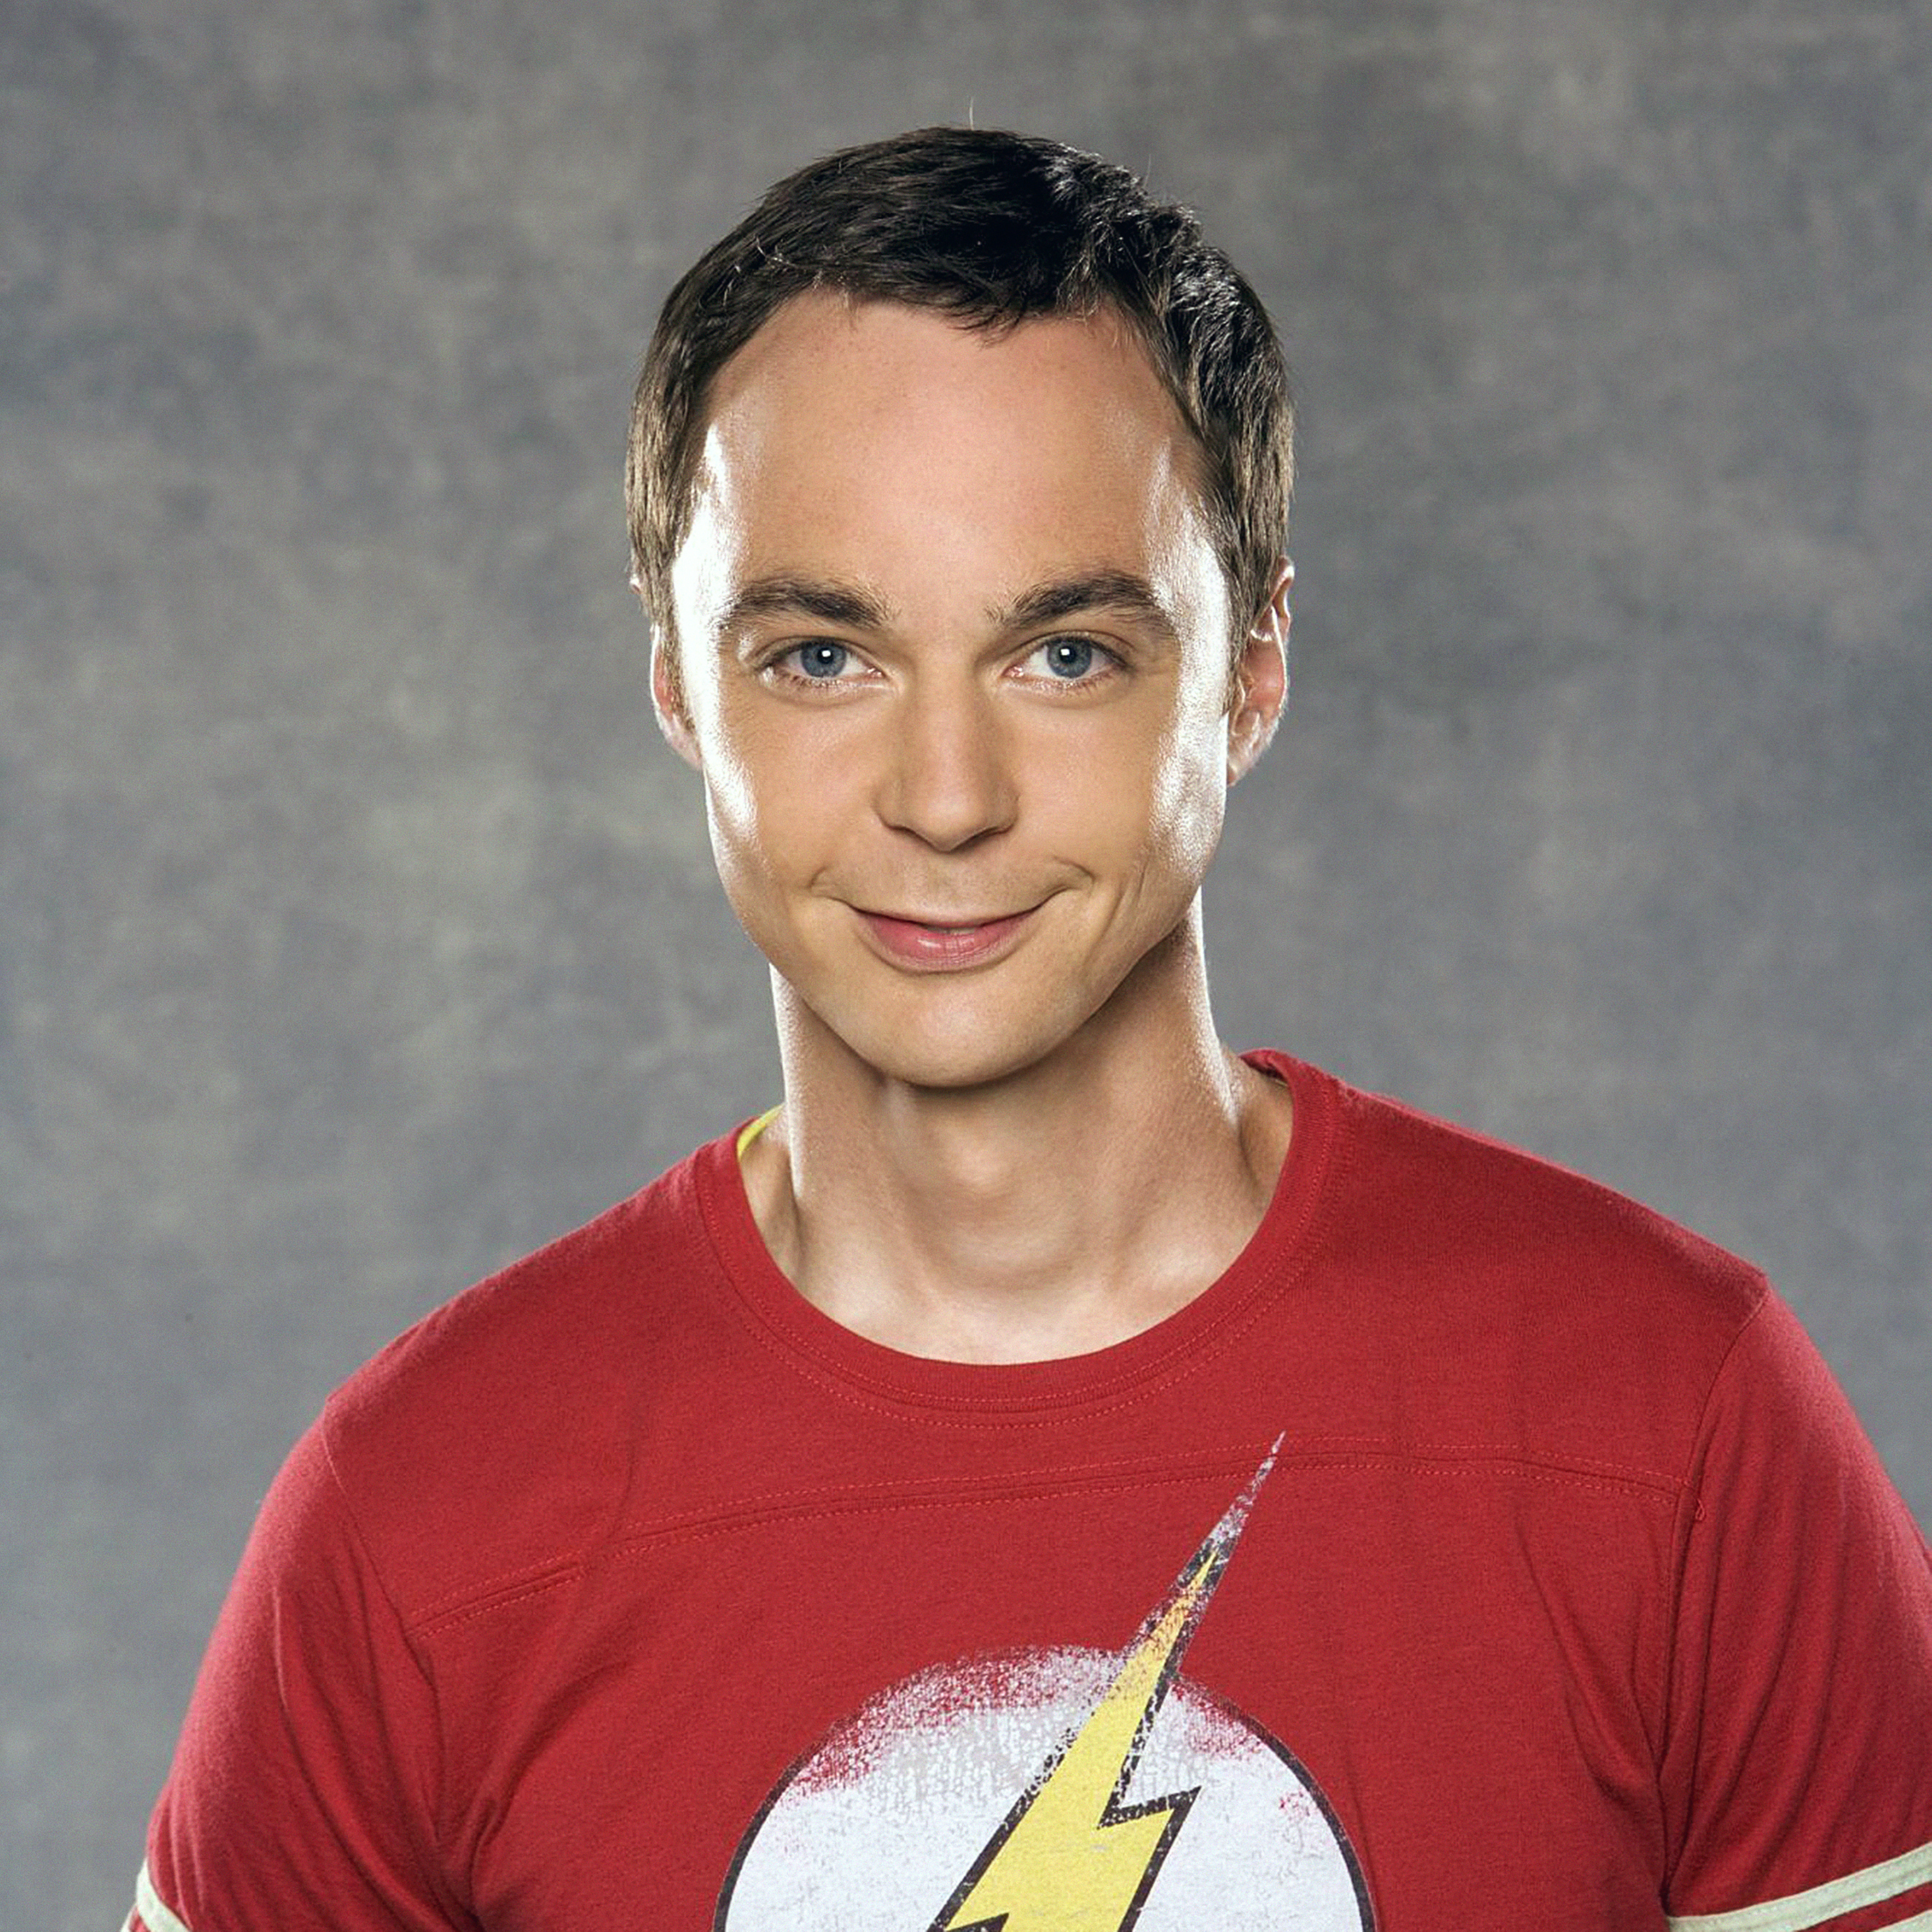 Hb28 Wallpaper Sheldon Cooper Big Bang Theory Bazinga Papers Co